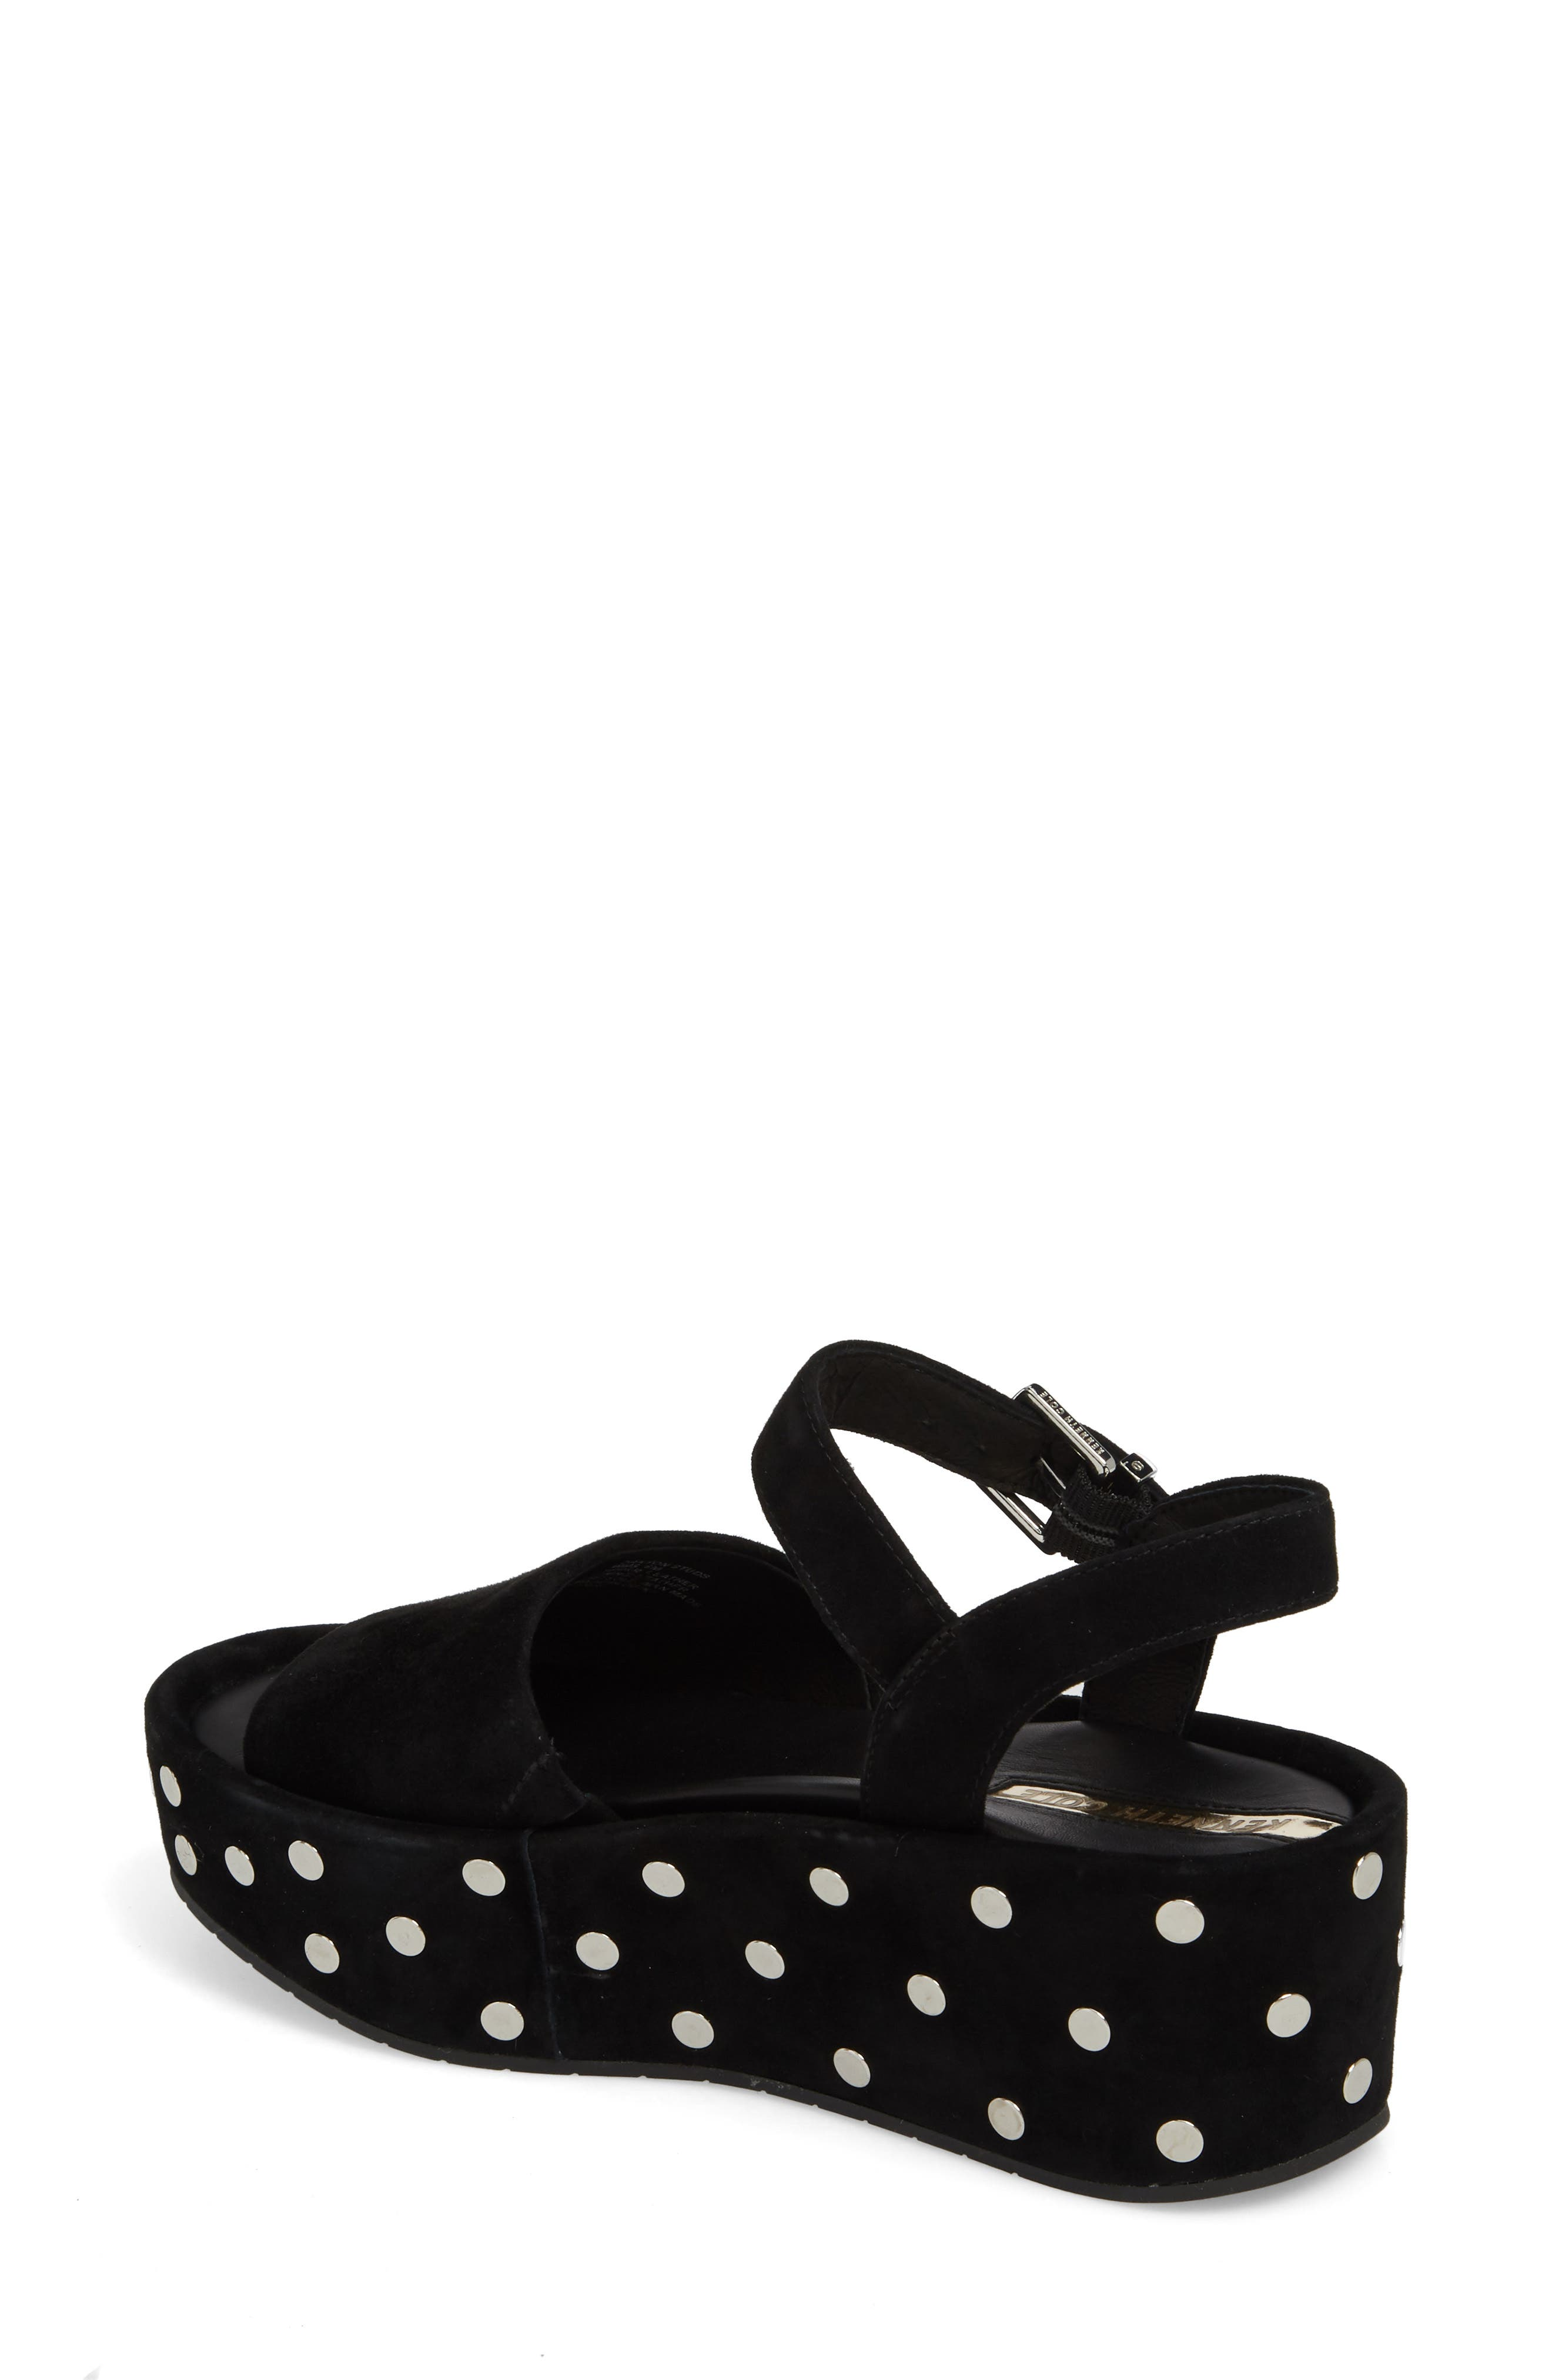 Danton Studs Platform Sandal,                             Alternate thumbnail 2, color,                             Black Suede